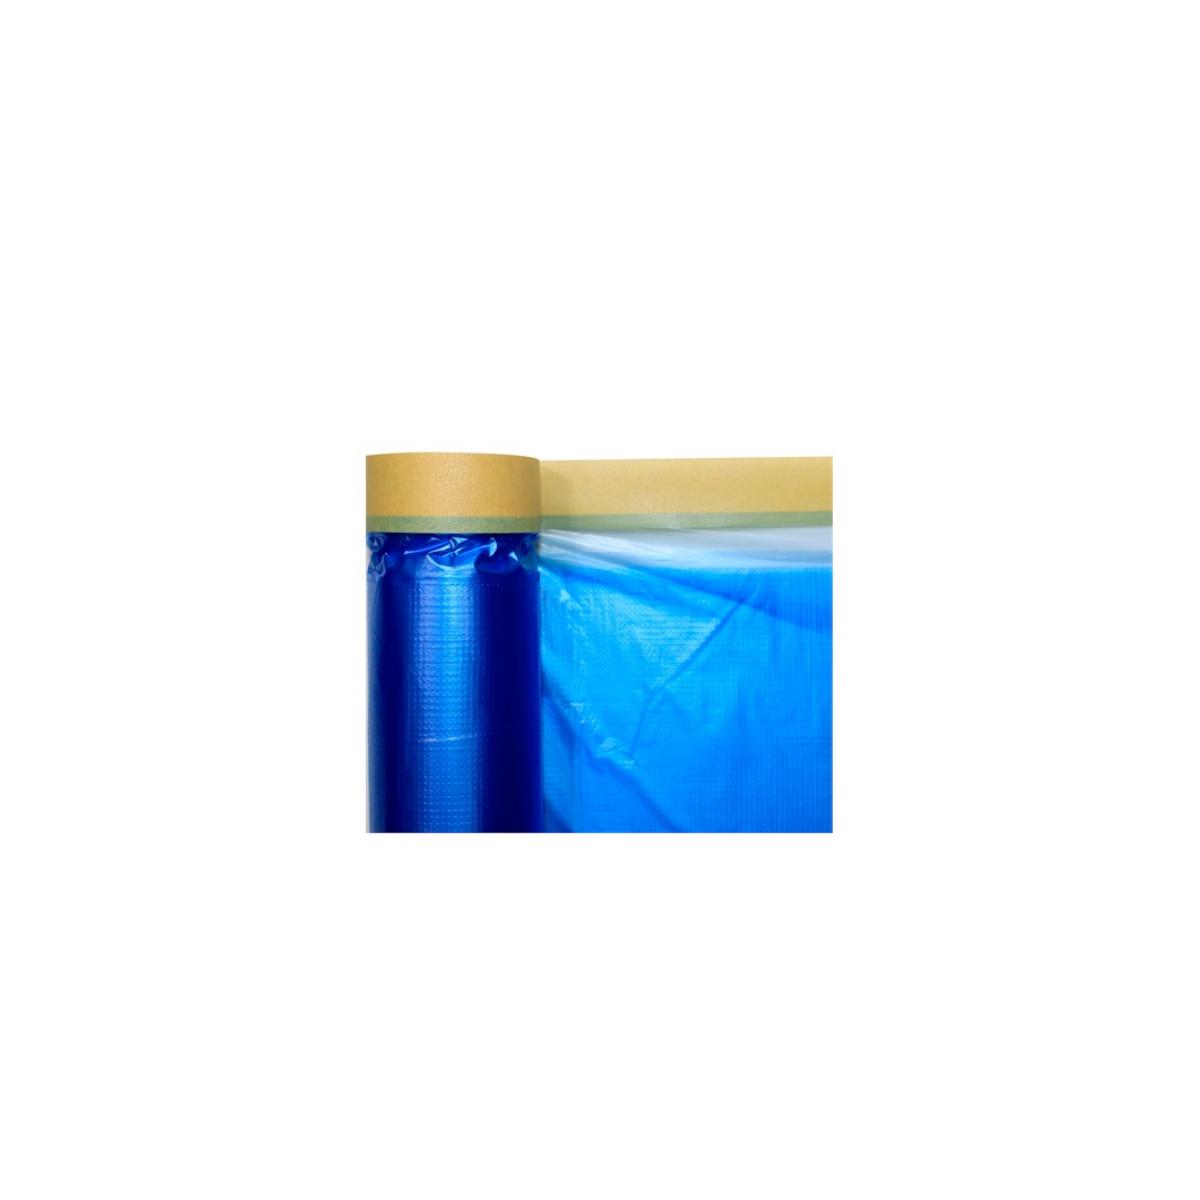 Salva Pintura 1,5x20 Metros Azul Proteção Tinta e Poeira